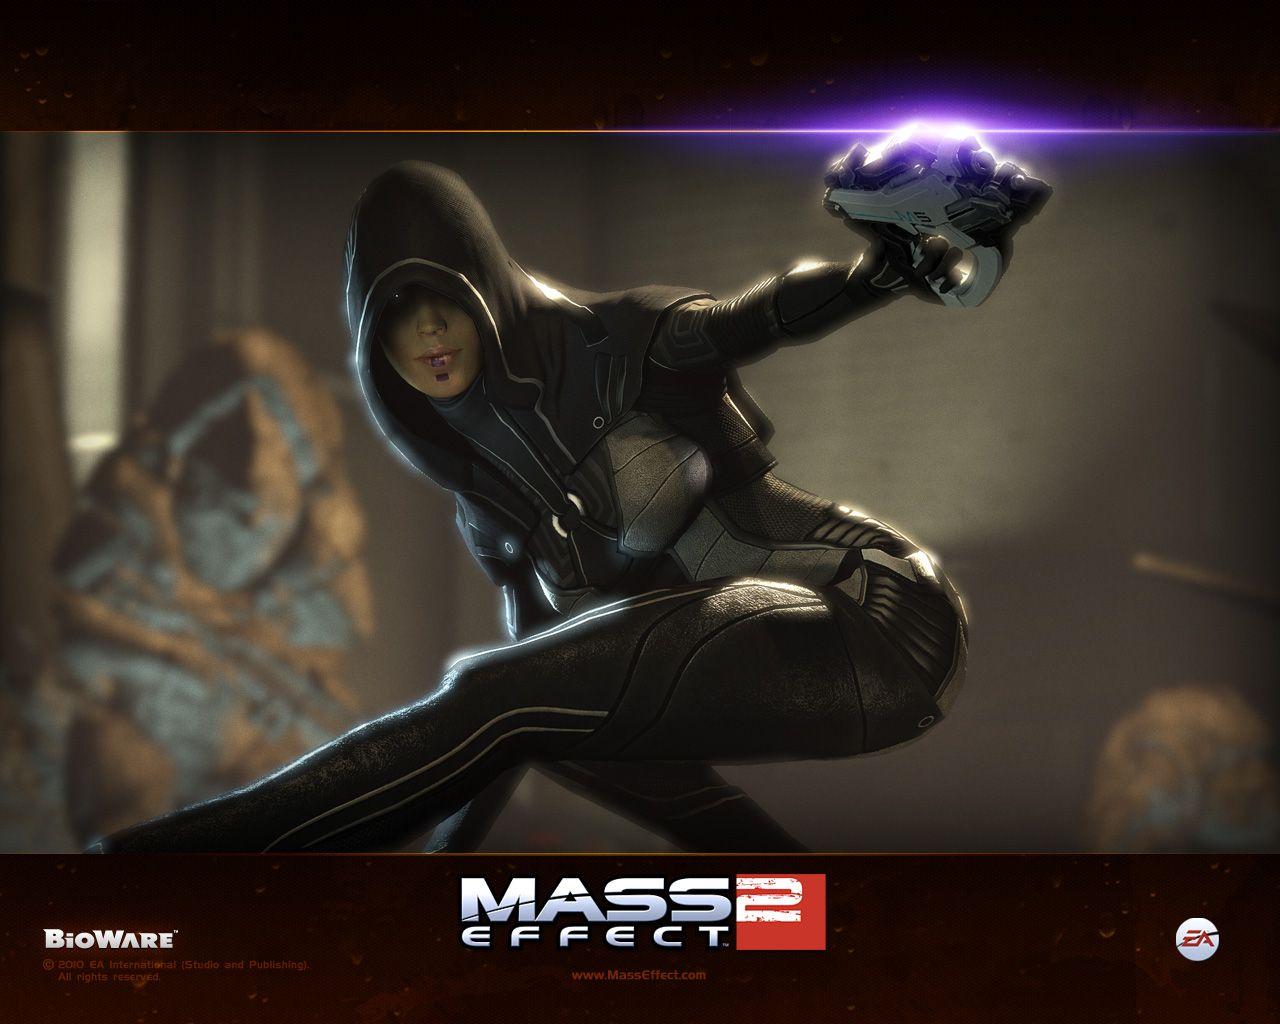 Mass Effect 2 - Kasumi Goto by SomethingGerman on DeviantArt